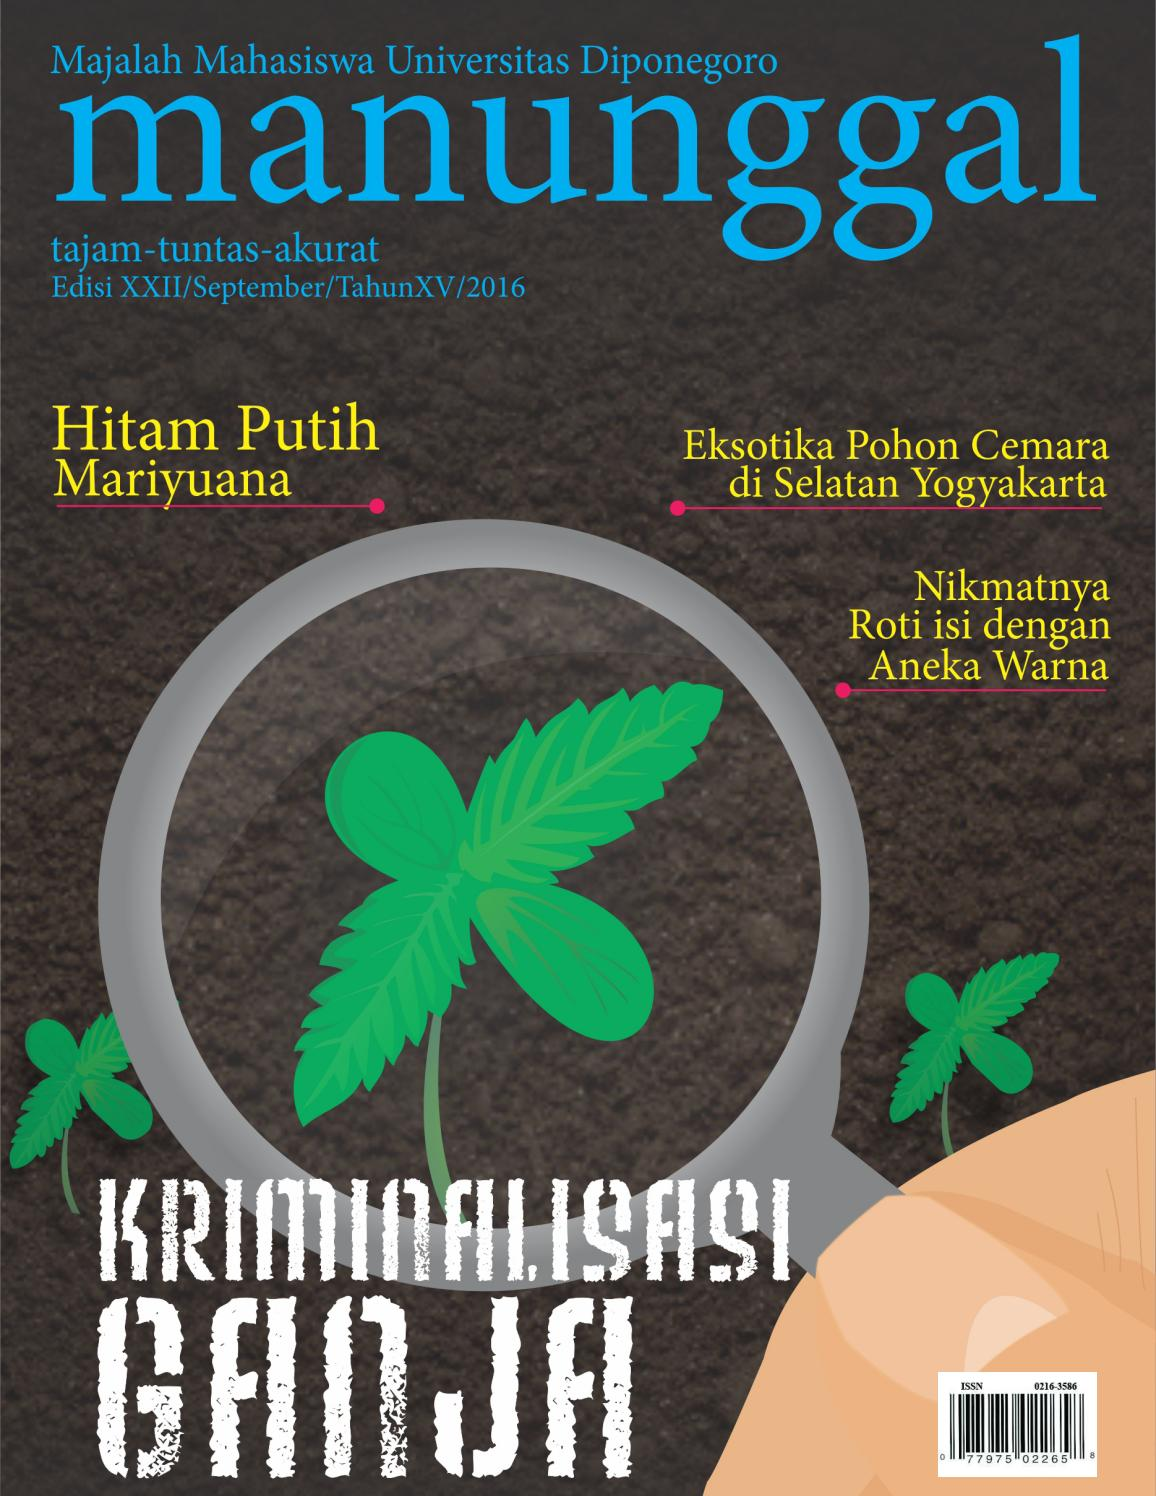 Majalah Manunggal Edisi XXII September Tahun XV 2016 By LPM